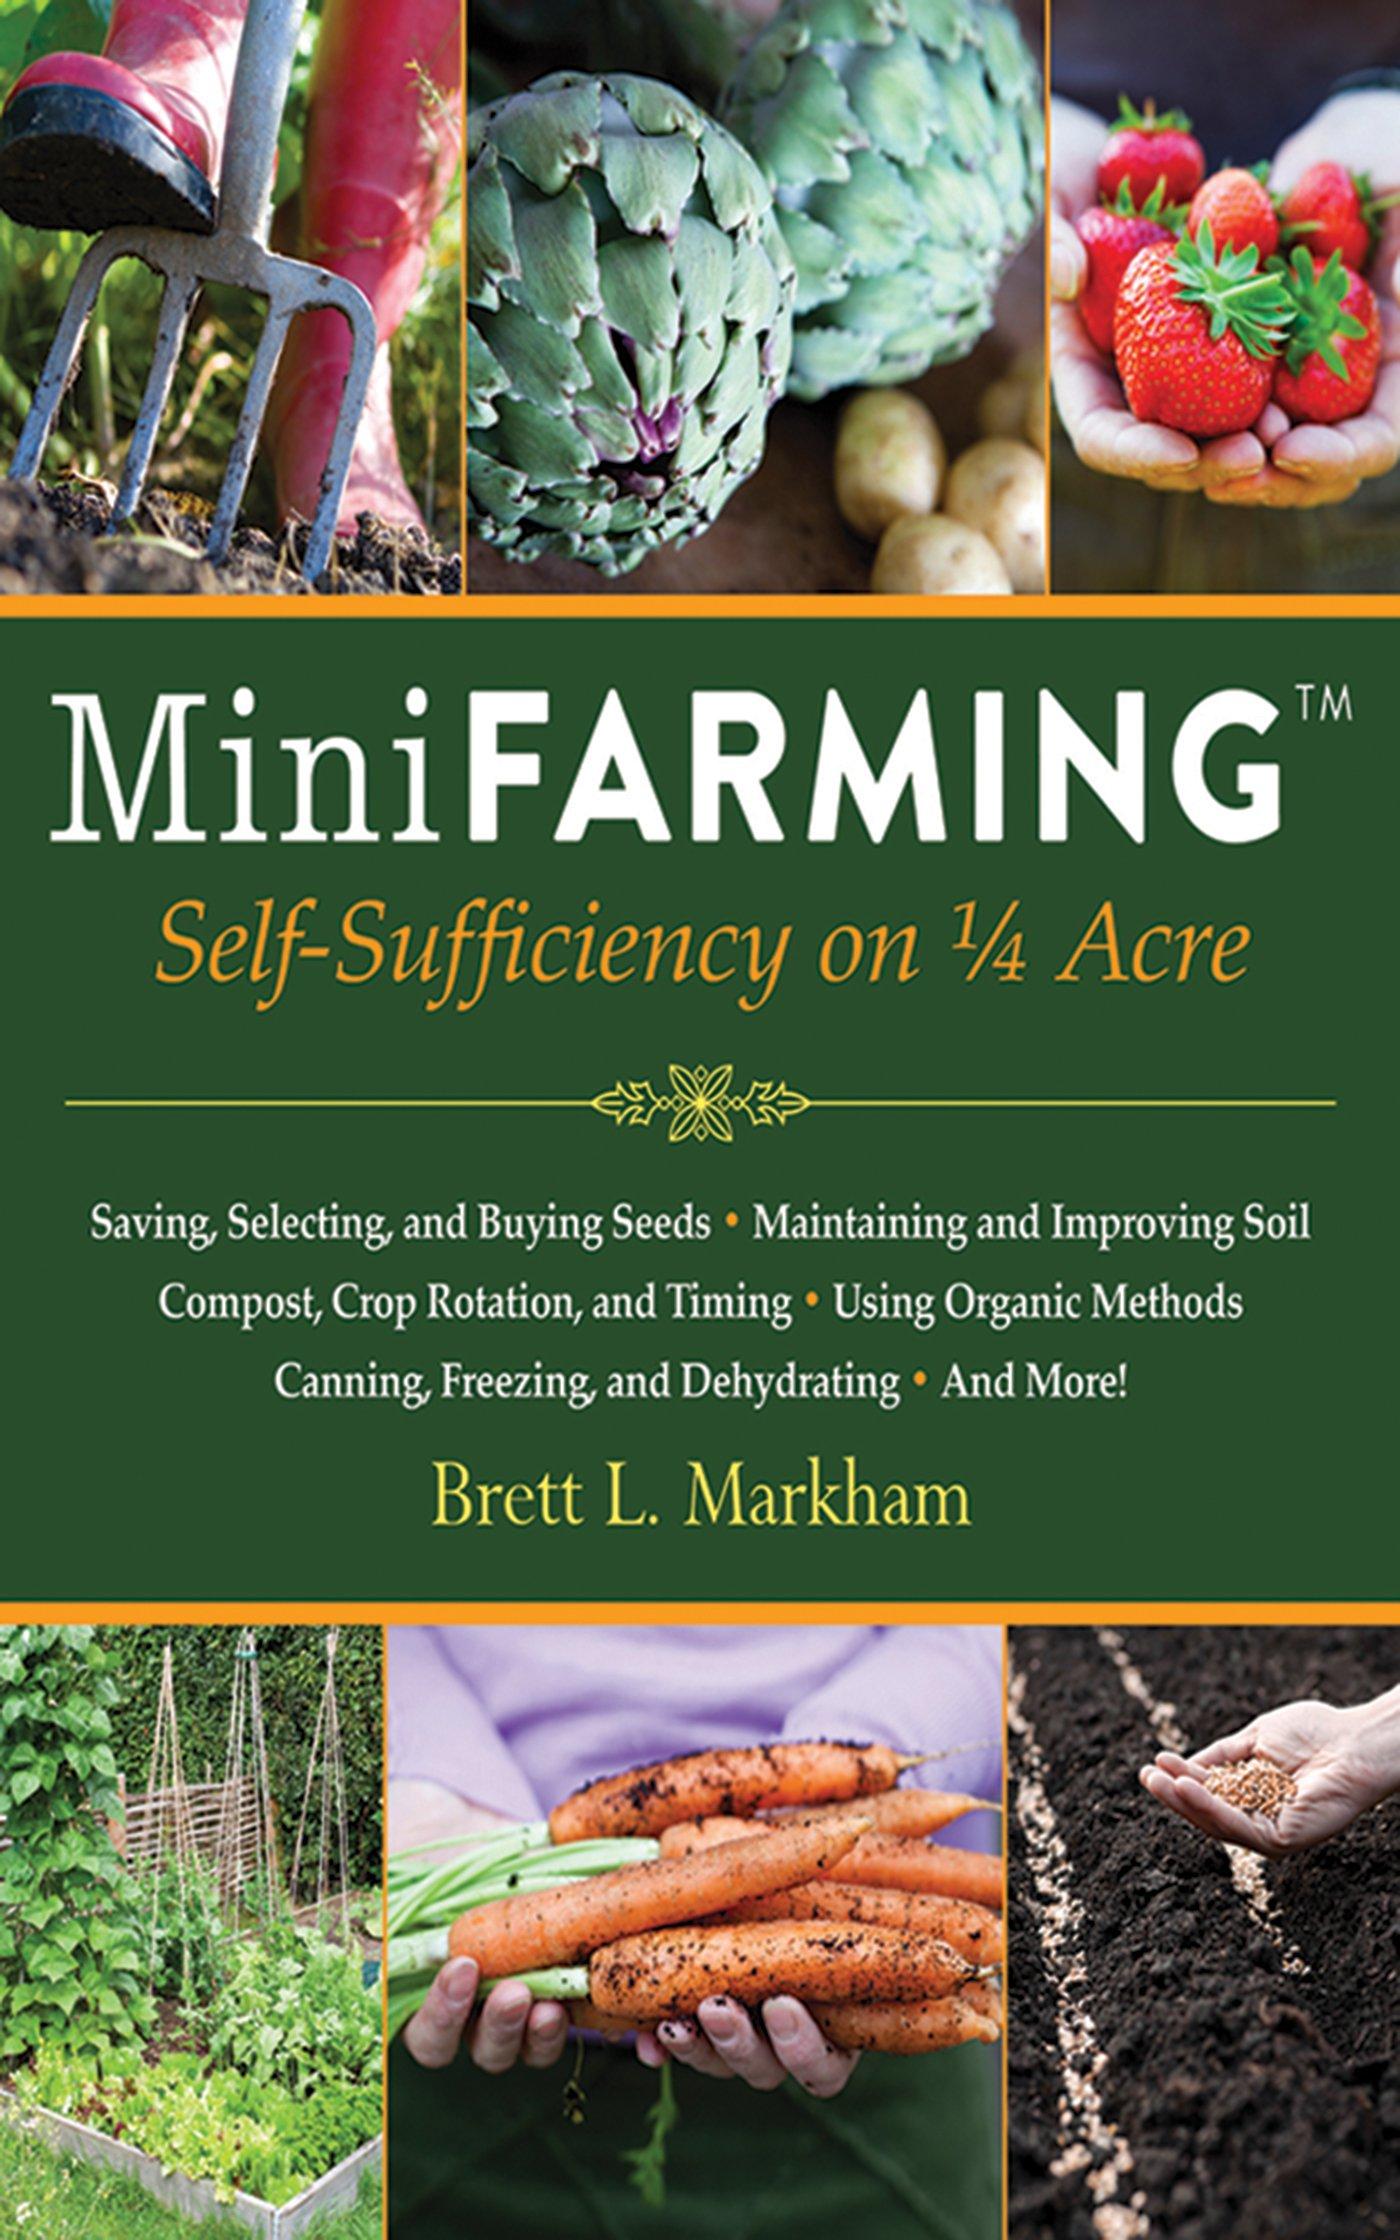 Mini Farming Self Sufficiency Brett Markham product image